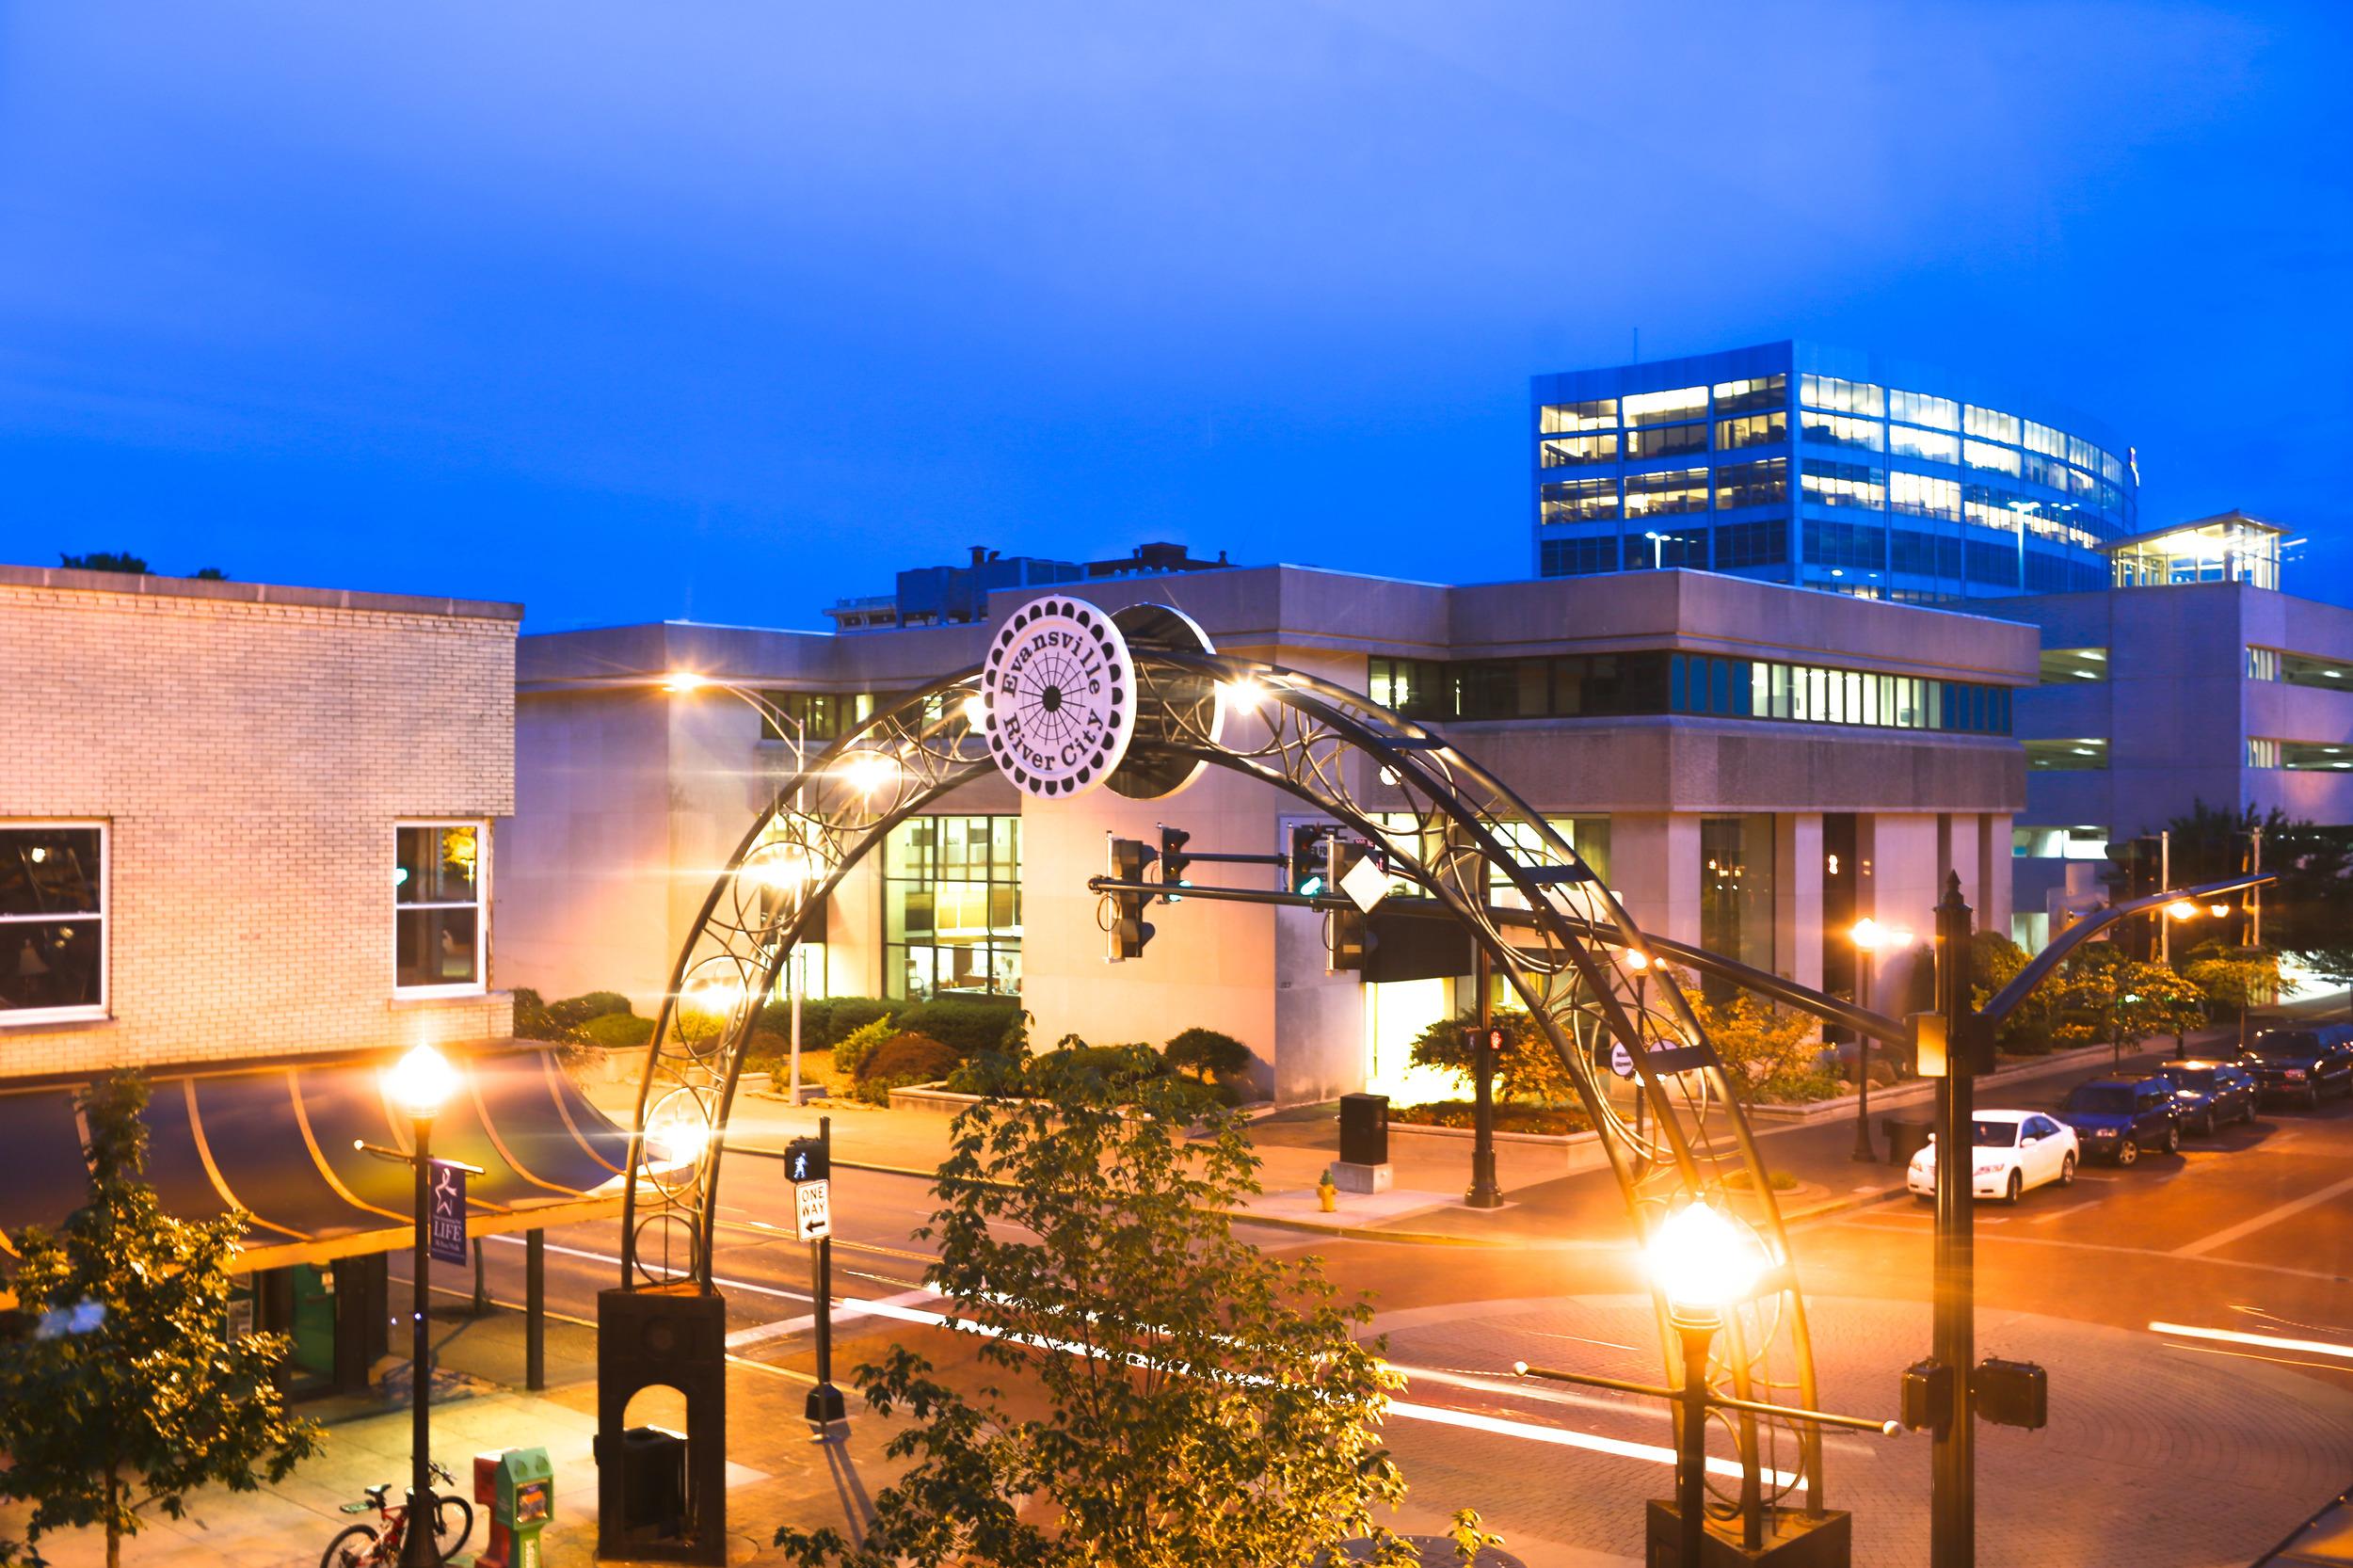 Evansville-RMPhoto-insta-2.jpg